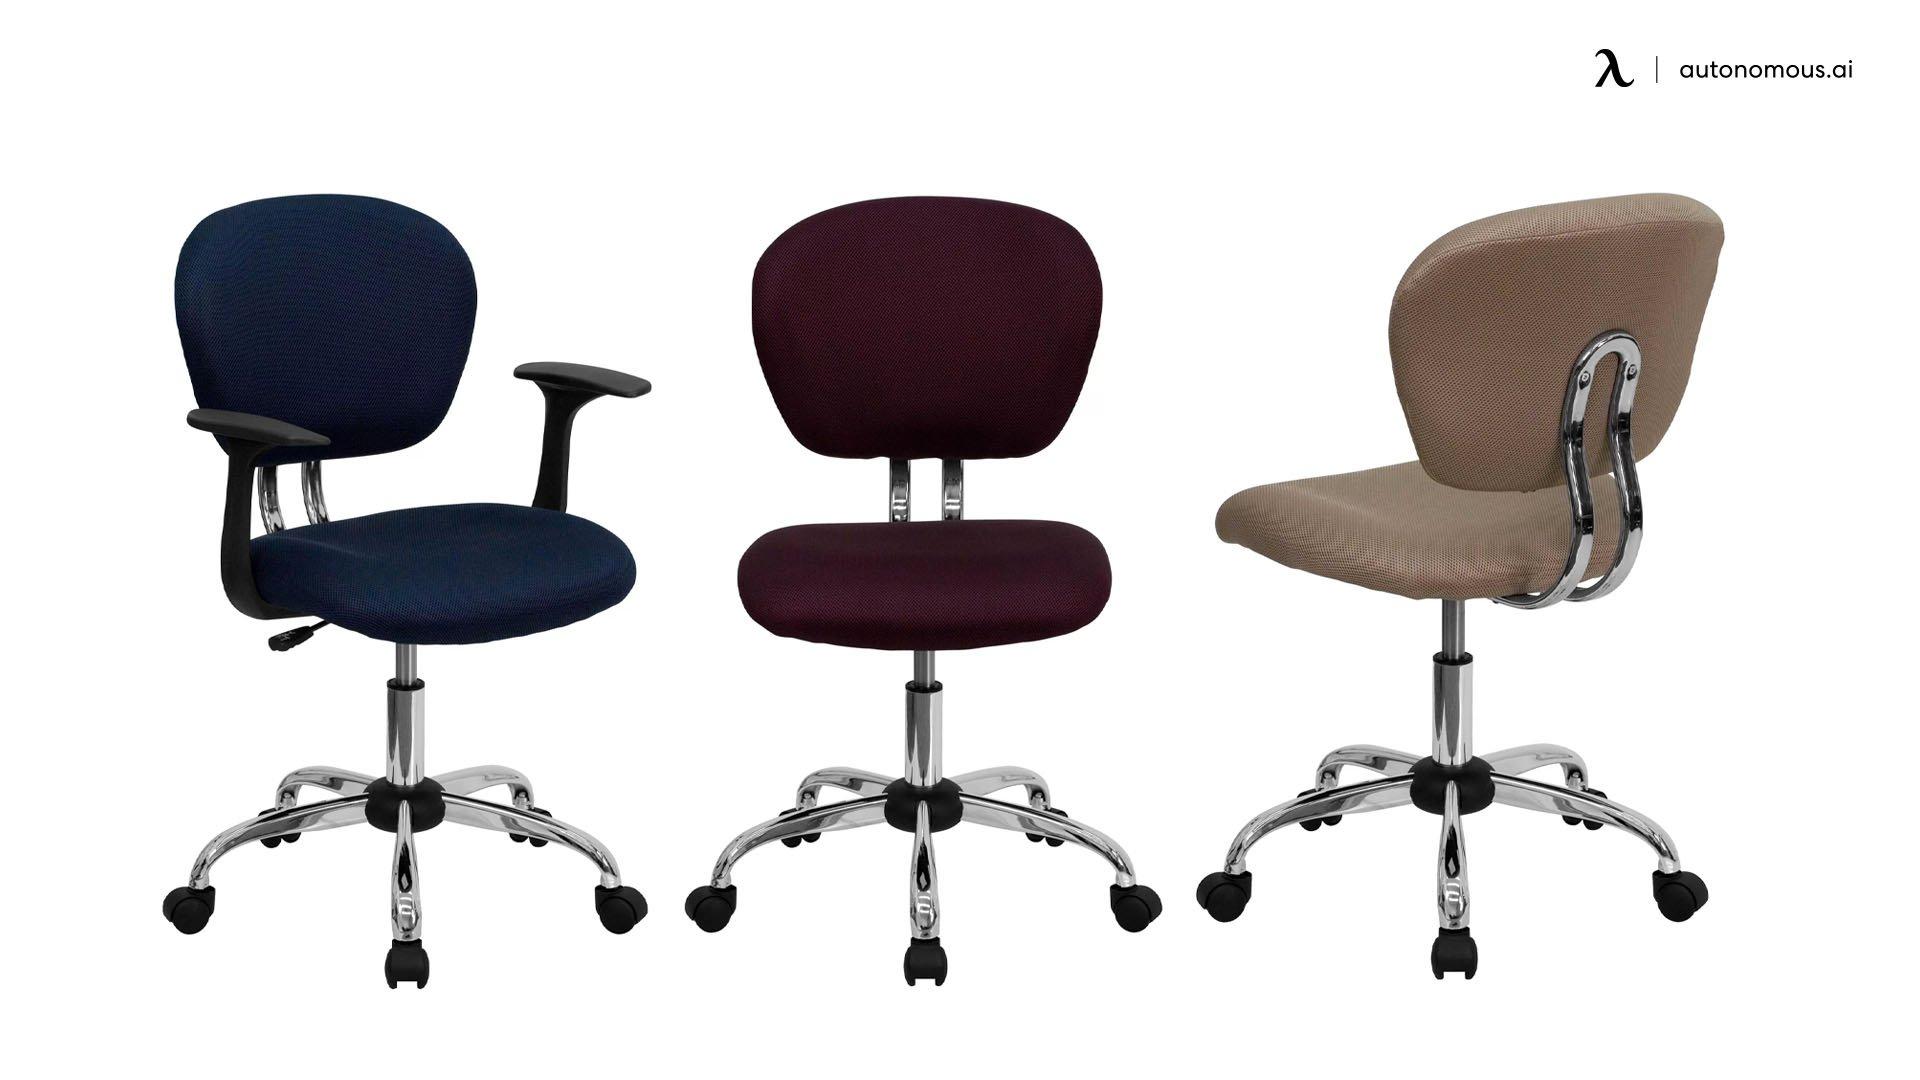 Wayfair Basics Ergonomic Chair